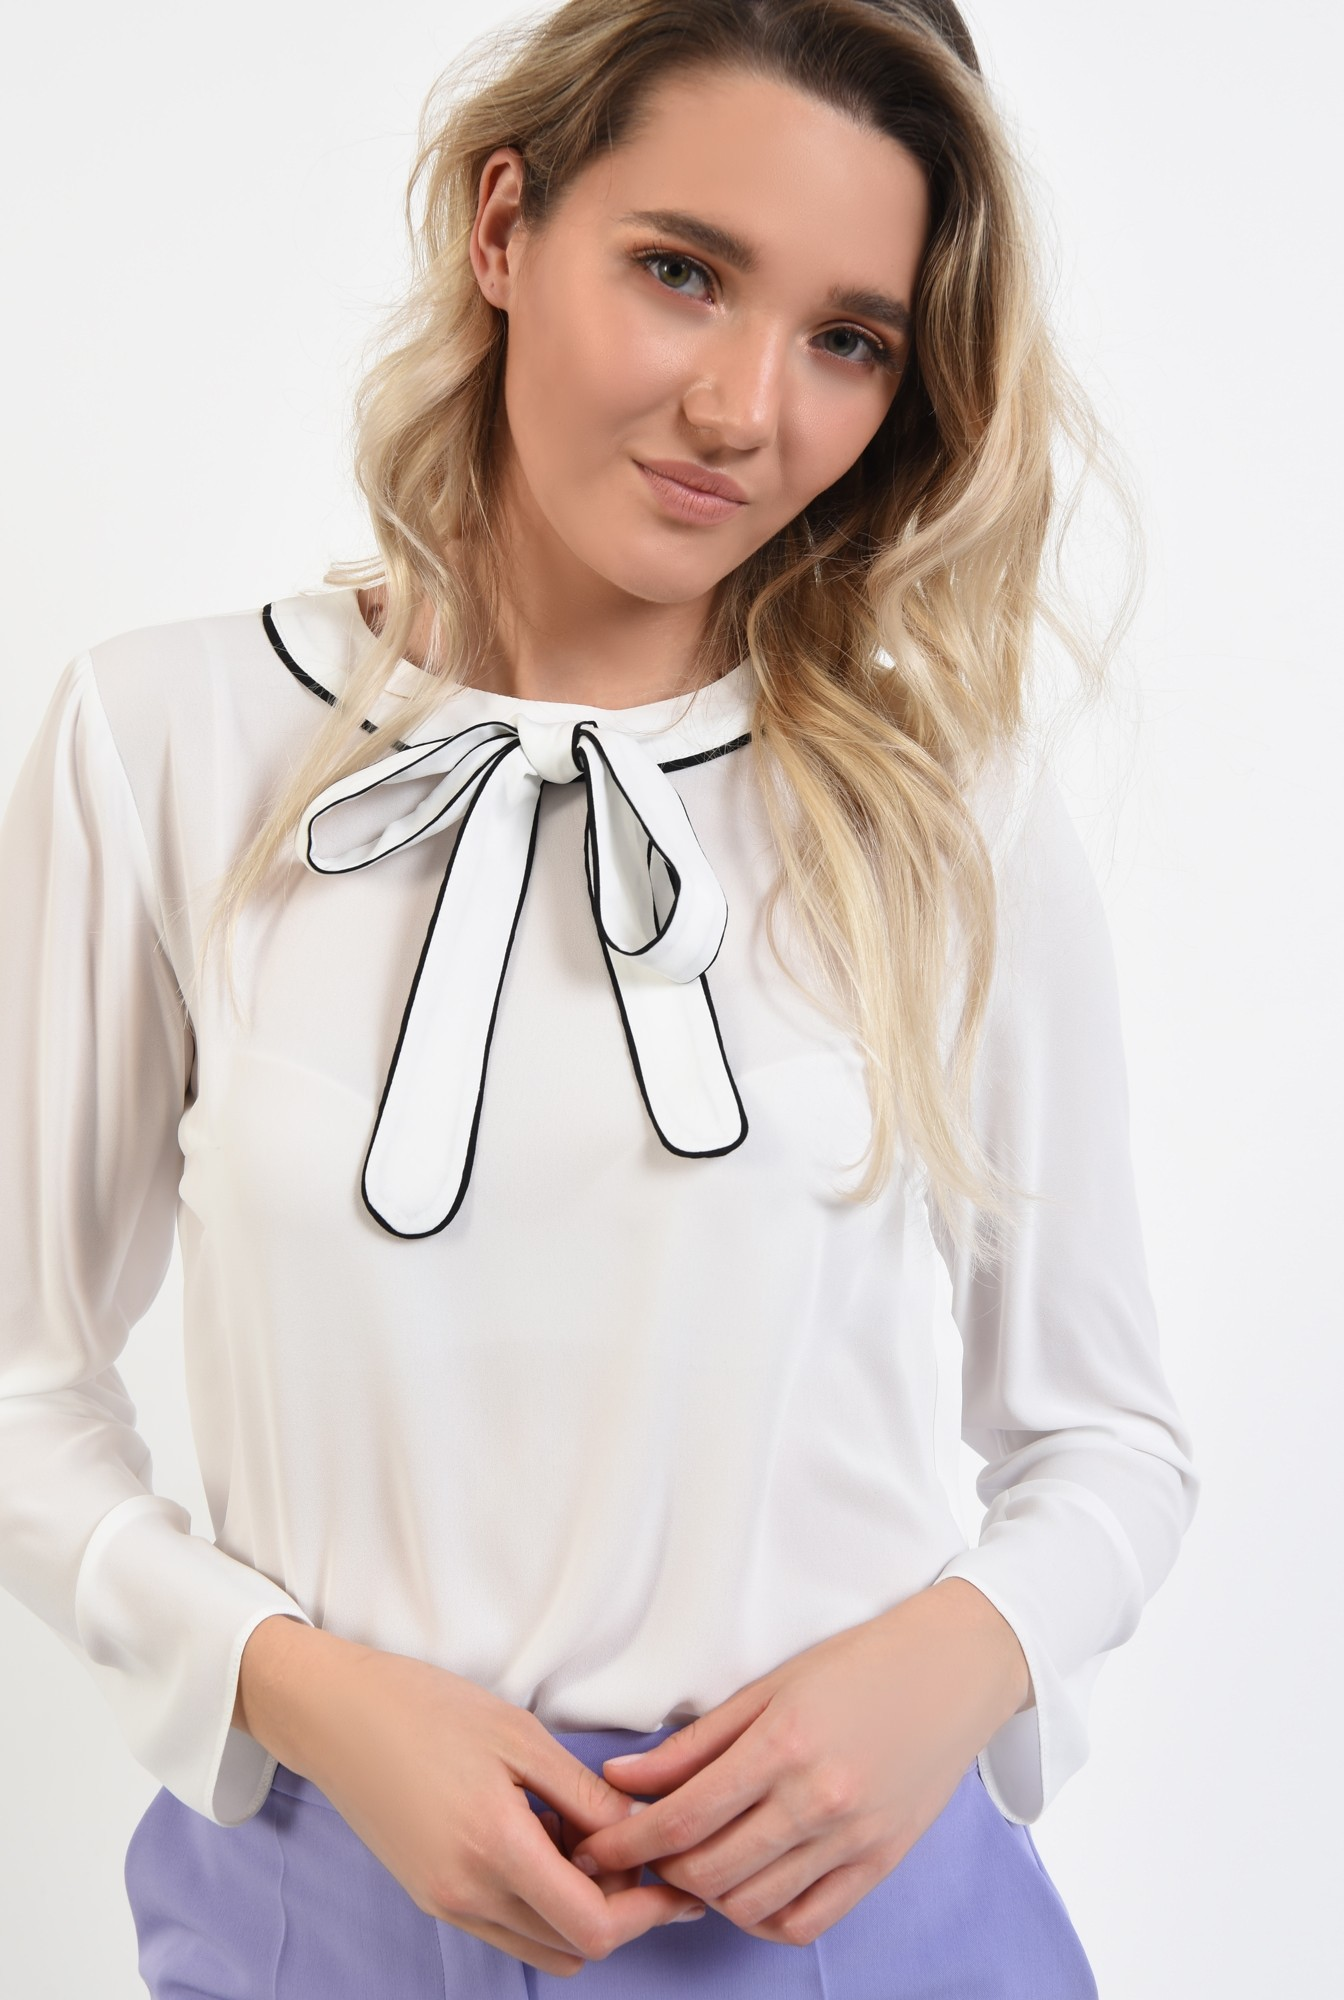 2 - bluza office, maneci lungi, funda cu borduri contrastante, alb, bluza de primavara